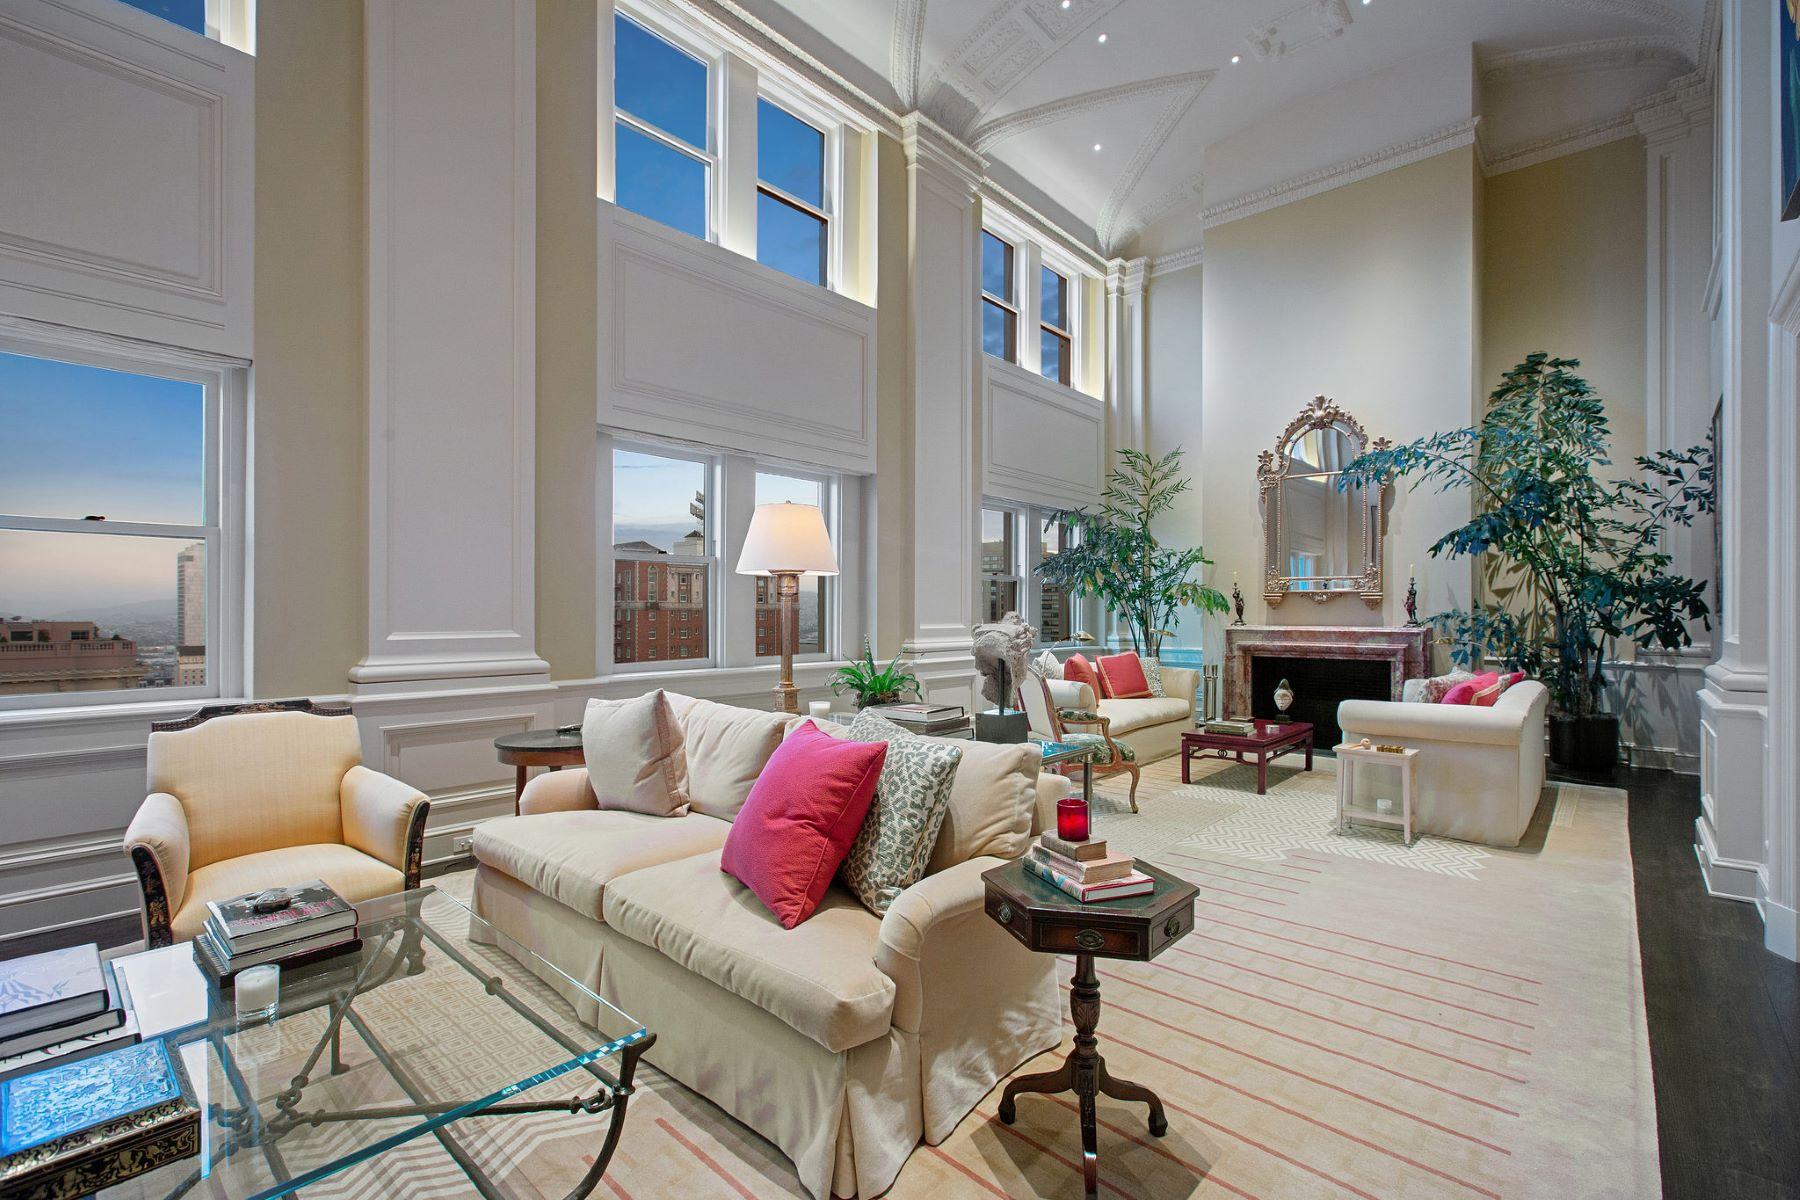 Apartments 为 销售 在 Penthouse in the Park Lane 1100 Sacramento St, #1002 旧金山, 加利福尼亚州 94108 美国